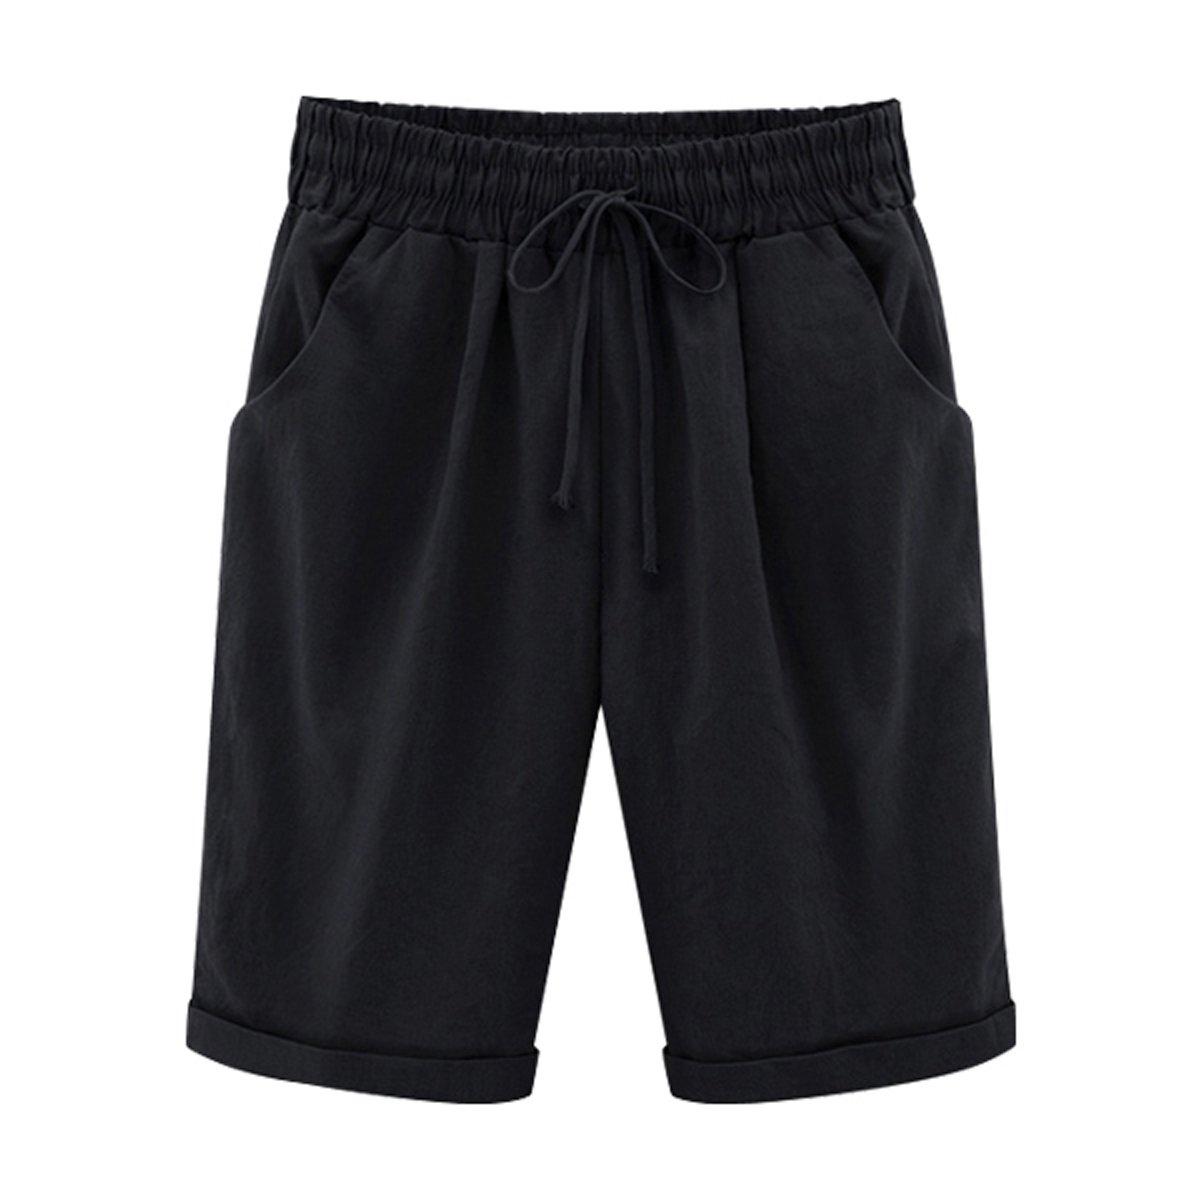 Fuwenni Women's Casual Plus Size Shorts with Elastic Waist Drawstring Black M by Fuwenni